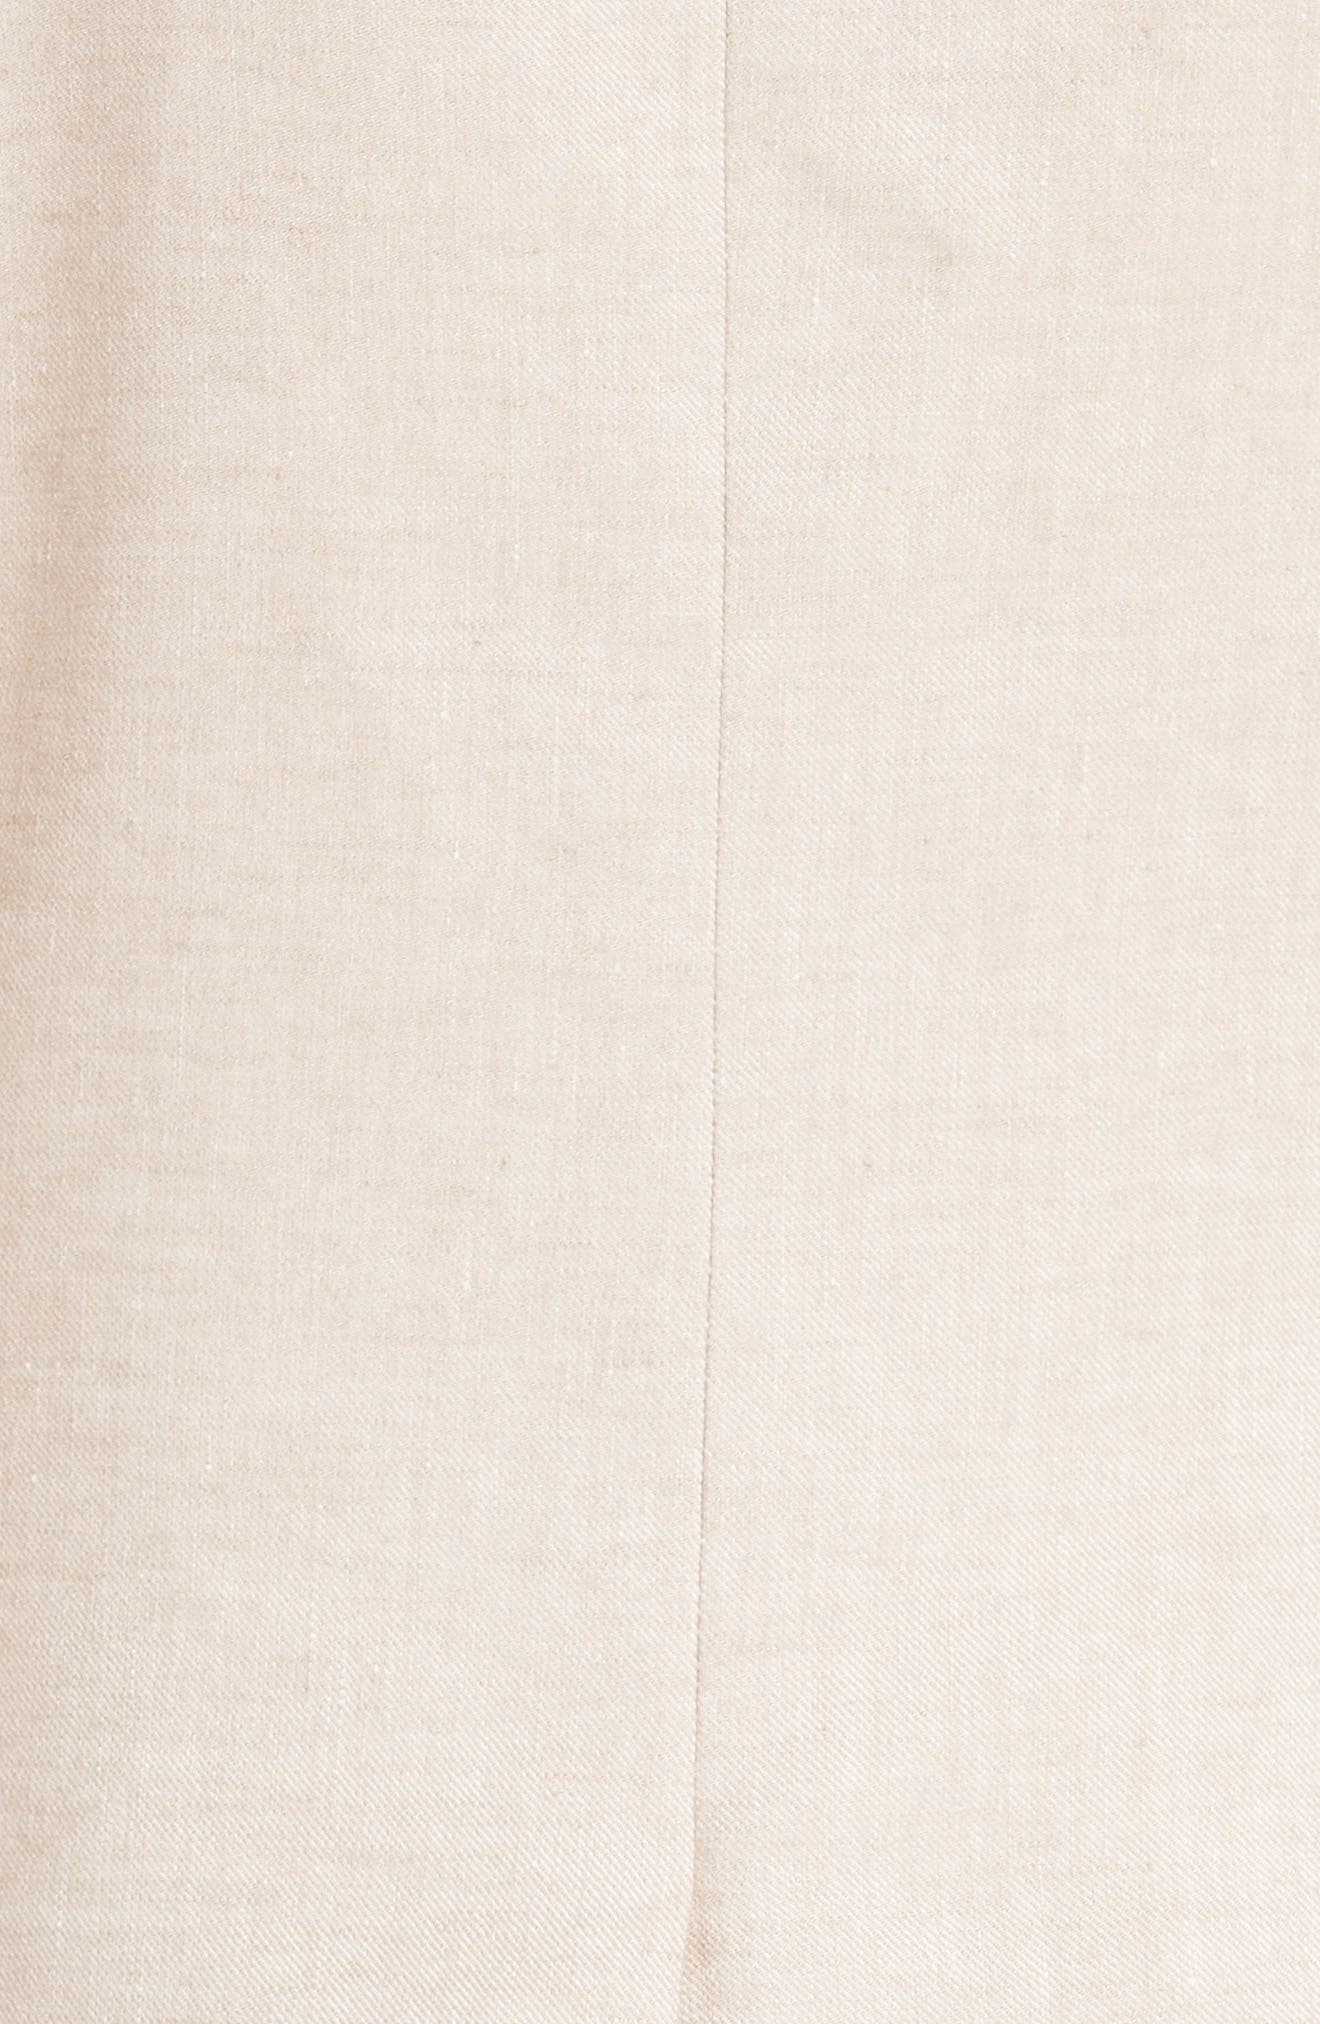 Turn-Up Collar Jacket,                             Alternate thumbnail 5, color,                             Beige